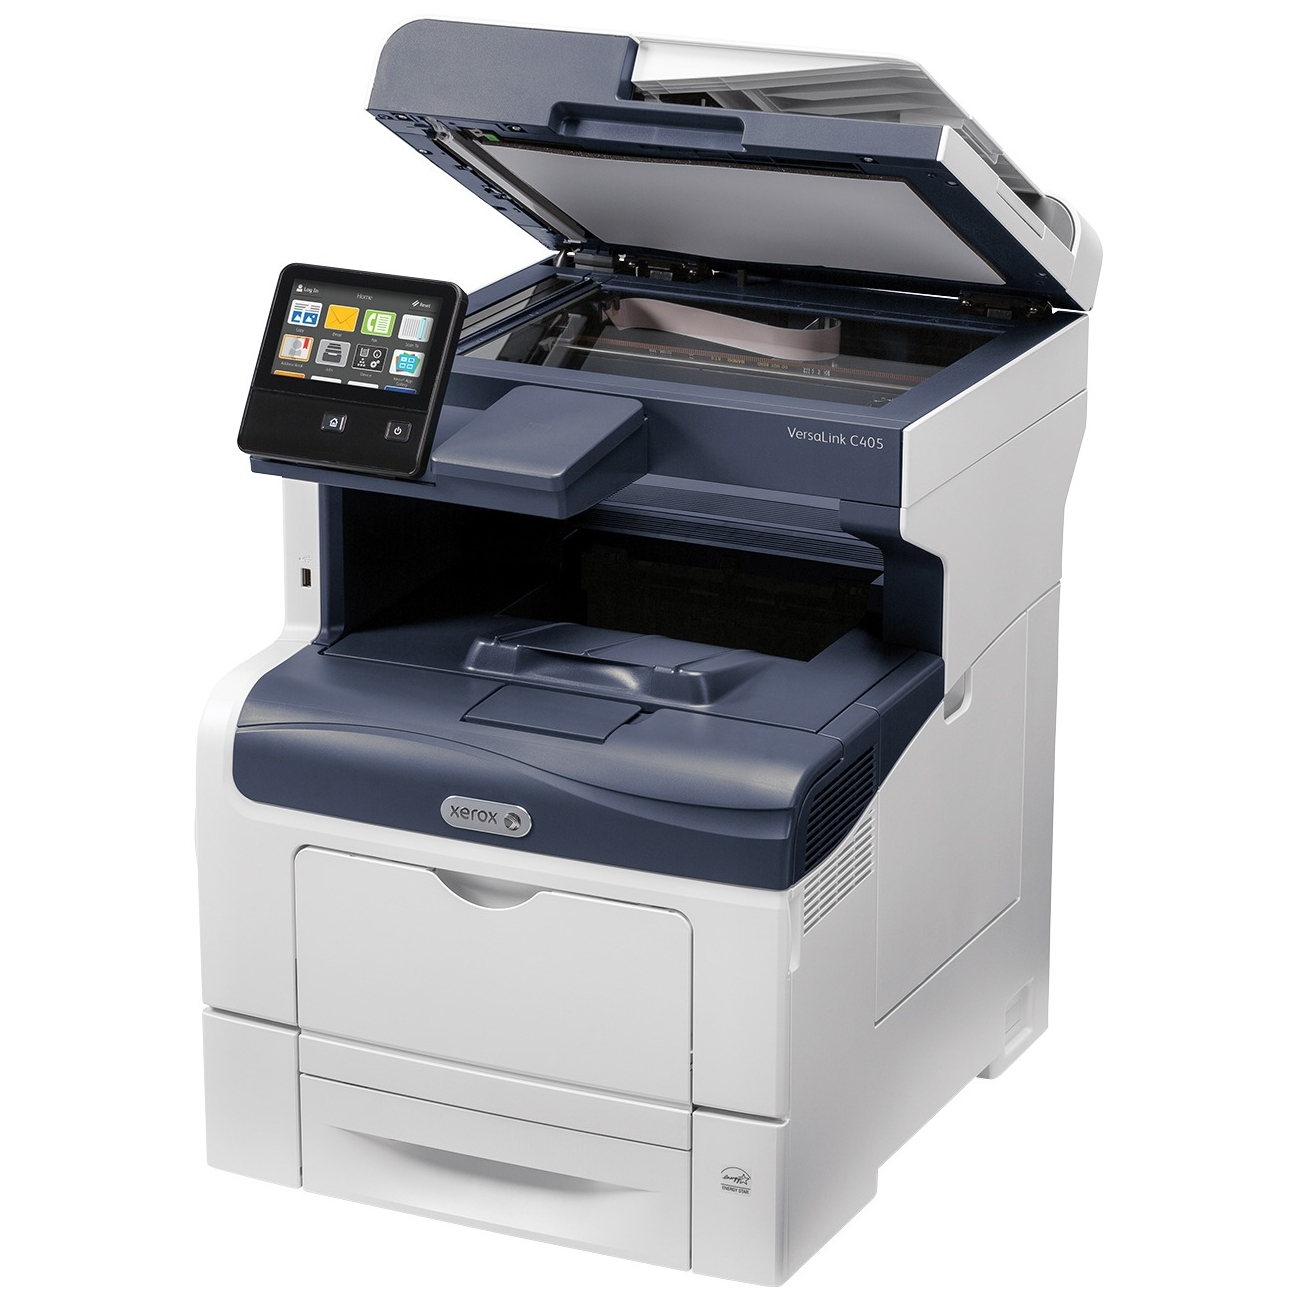 Versalink C405 Color Multifunction Printer, Prt/Cpy/Scn/Fax, Ltr/Lgl, Up To 36Pp